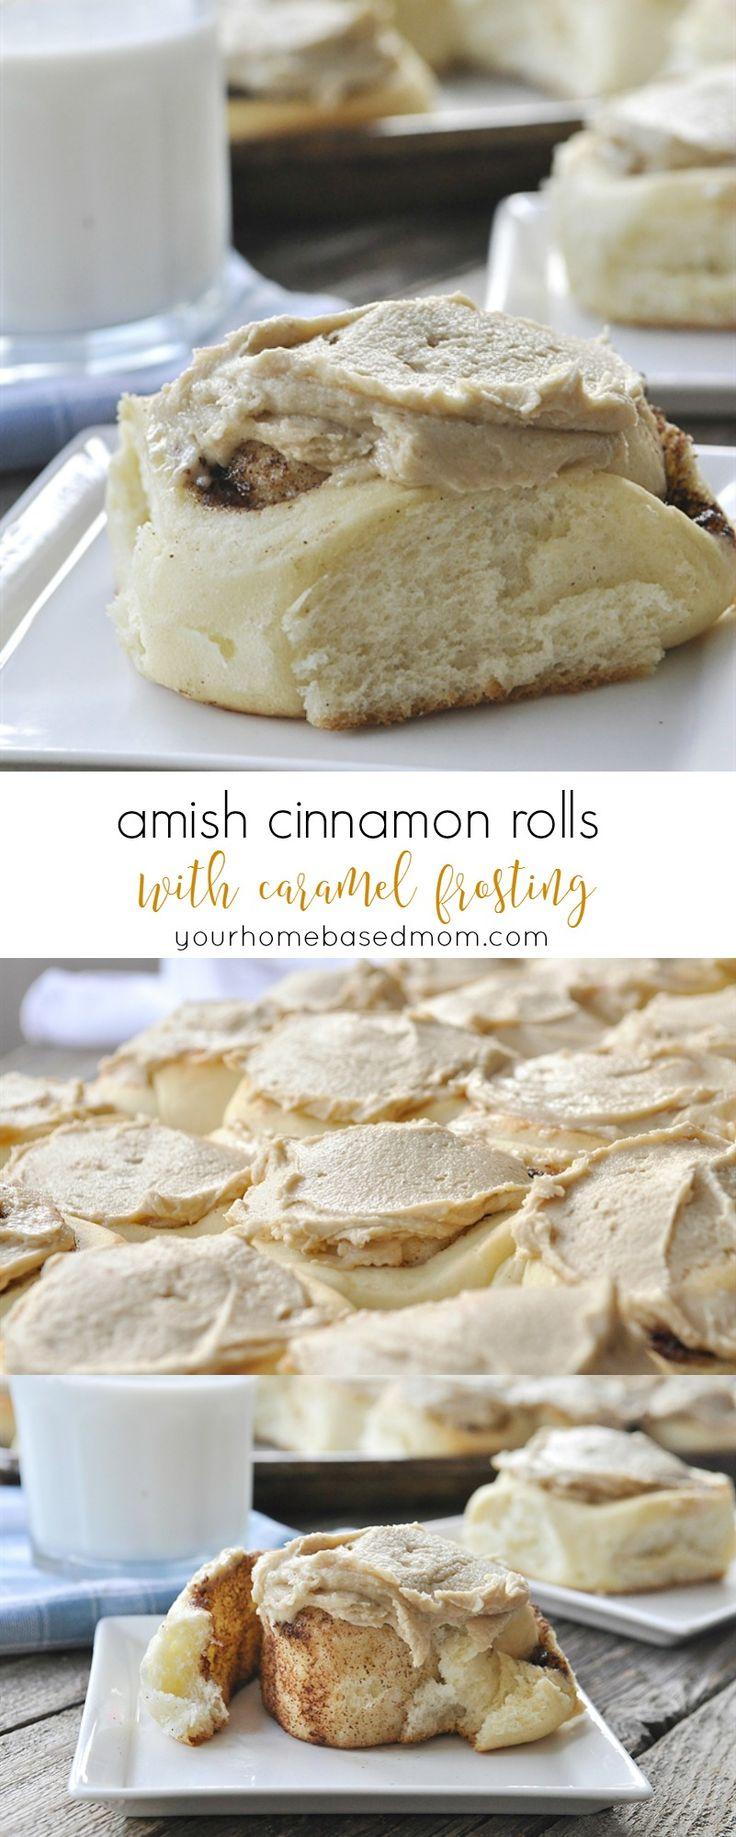 amish-cinnamon-rolls-with-caramel-frosting-c